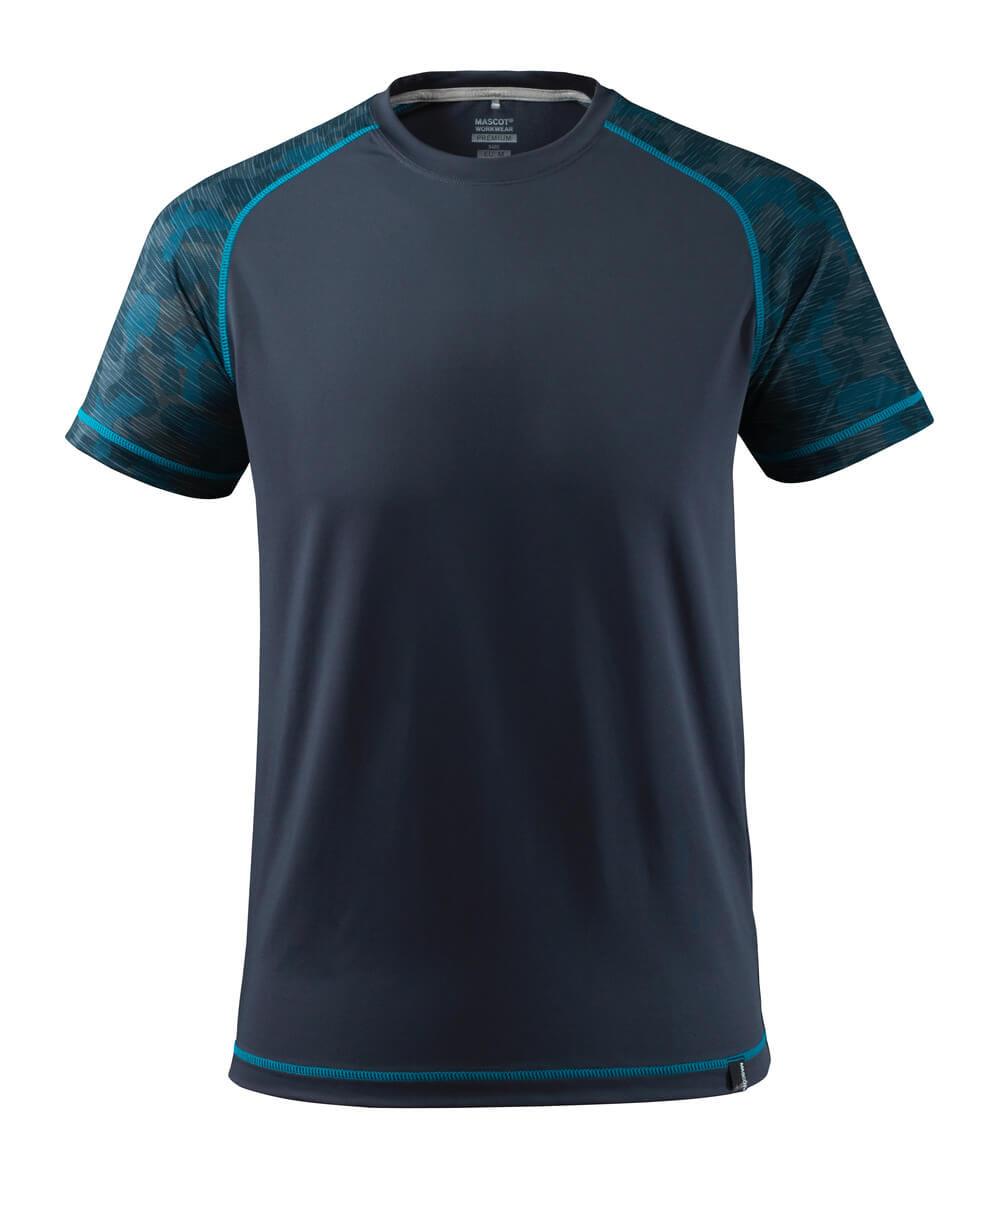 17482-944-010 T-shirt - dark navy